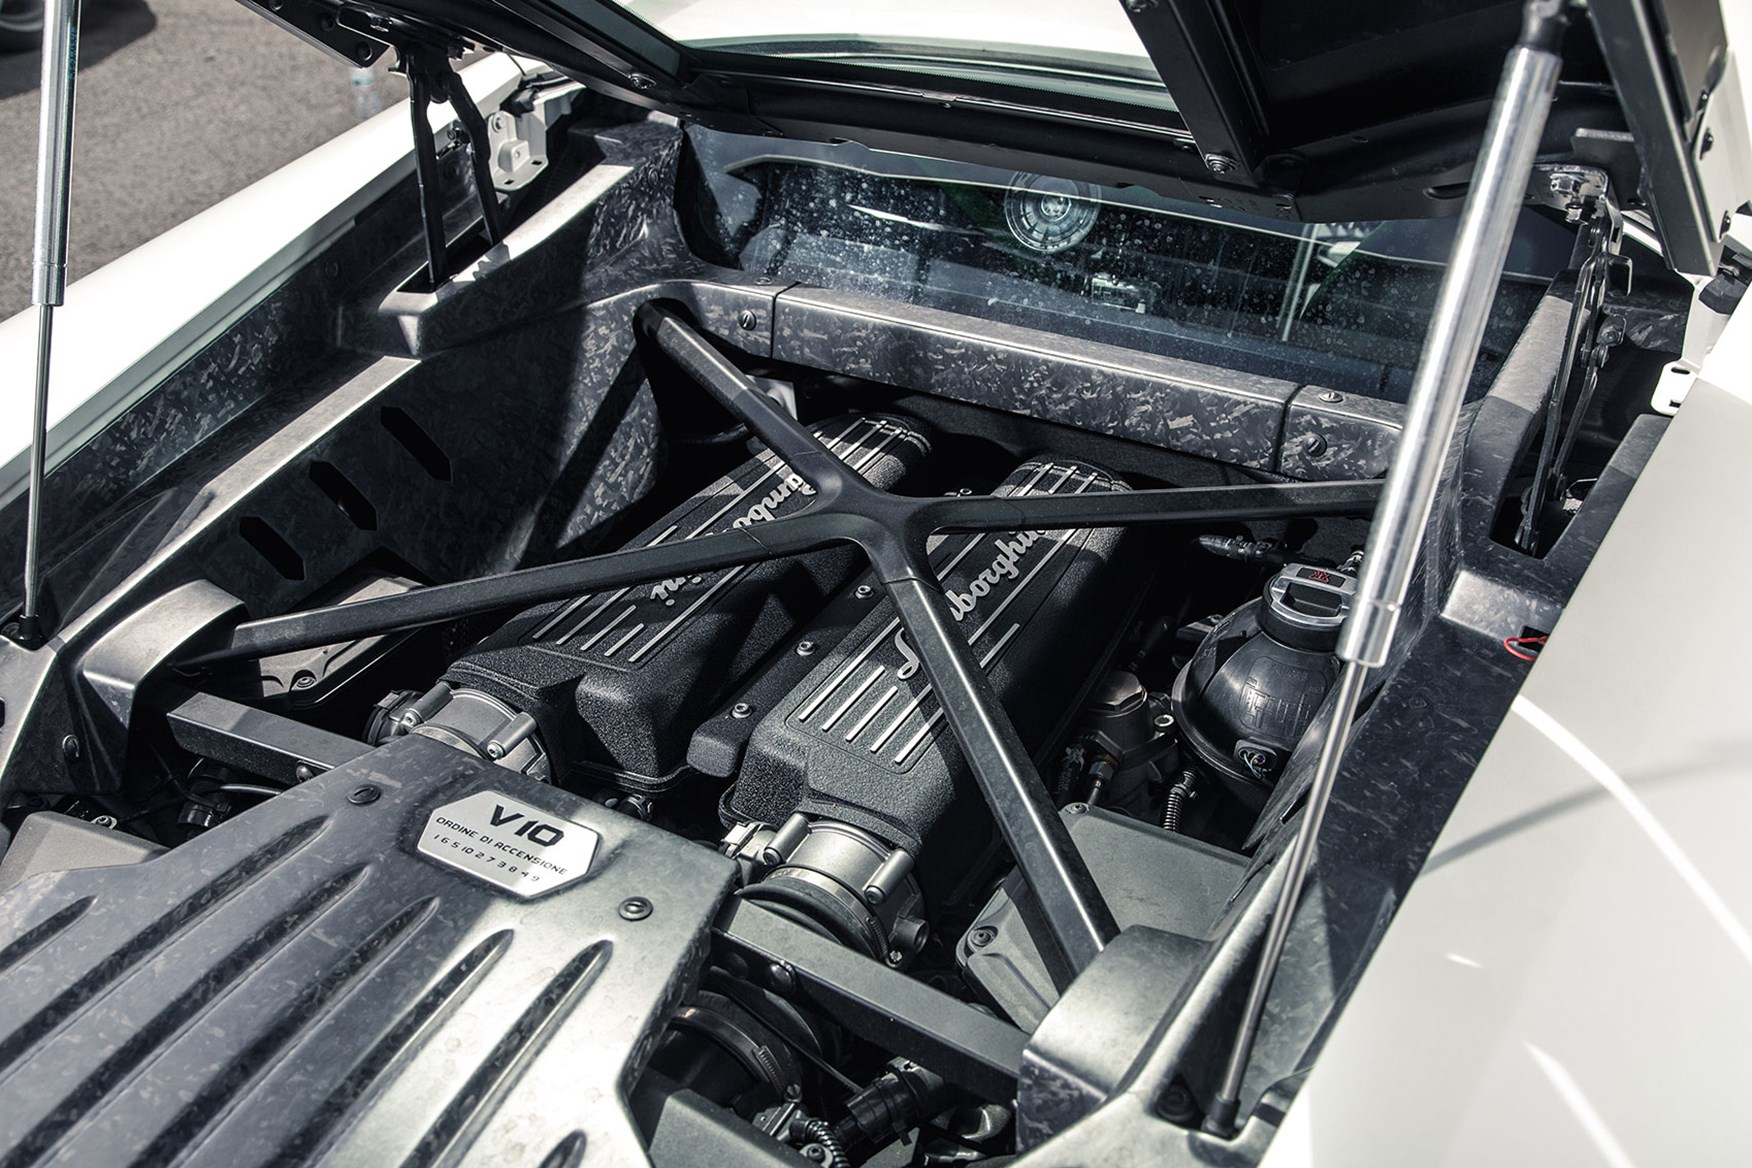 Lamborghini huracan engine bay